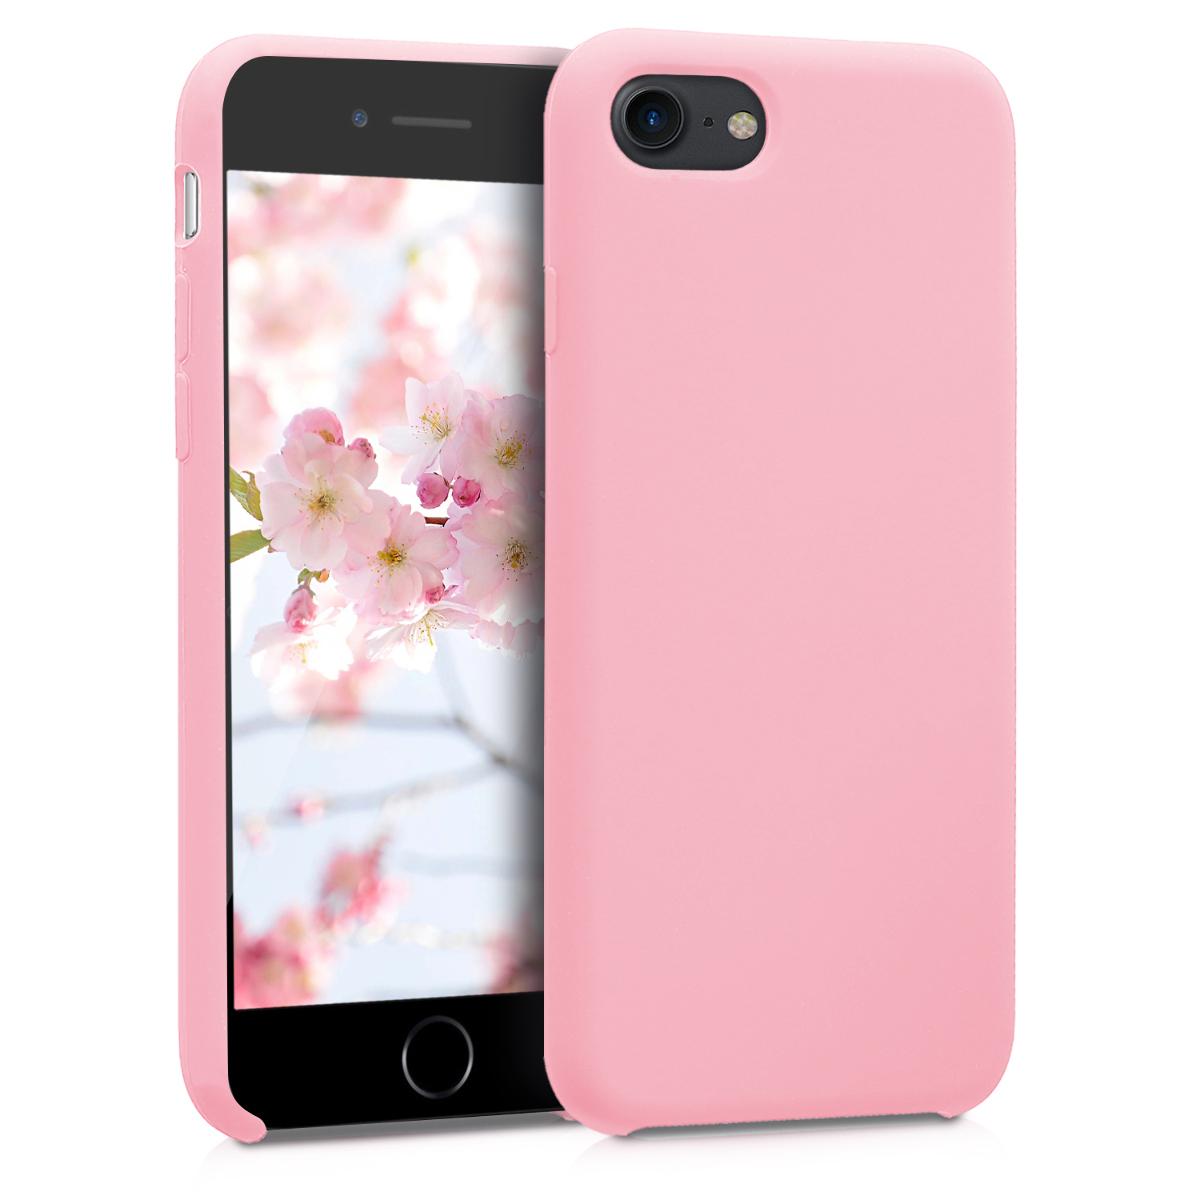 KW Soft Flexible Rubber Θήκη Σιλικόνης iPhone 7 / 8 - Light Pink (40225.110)